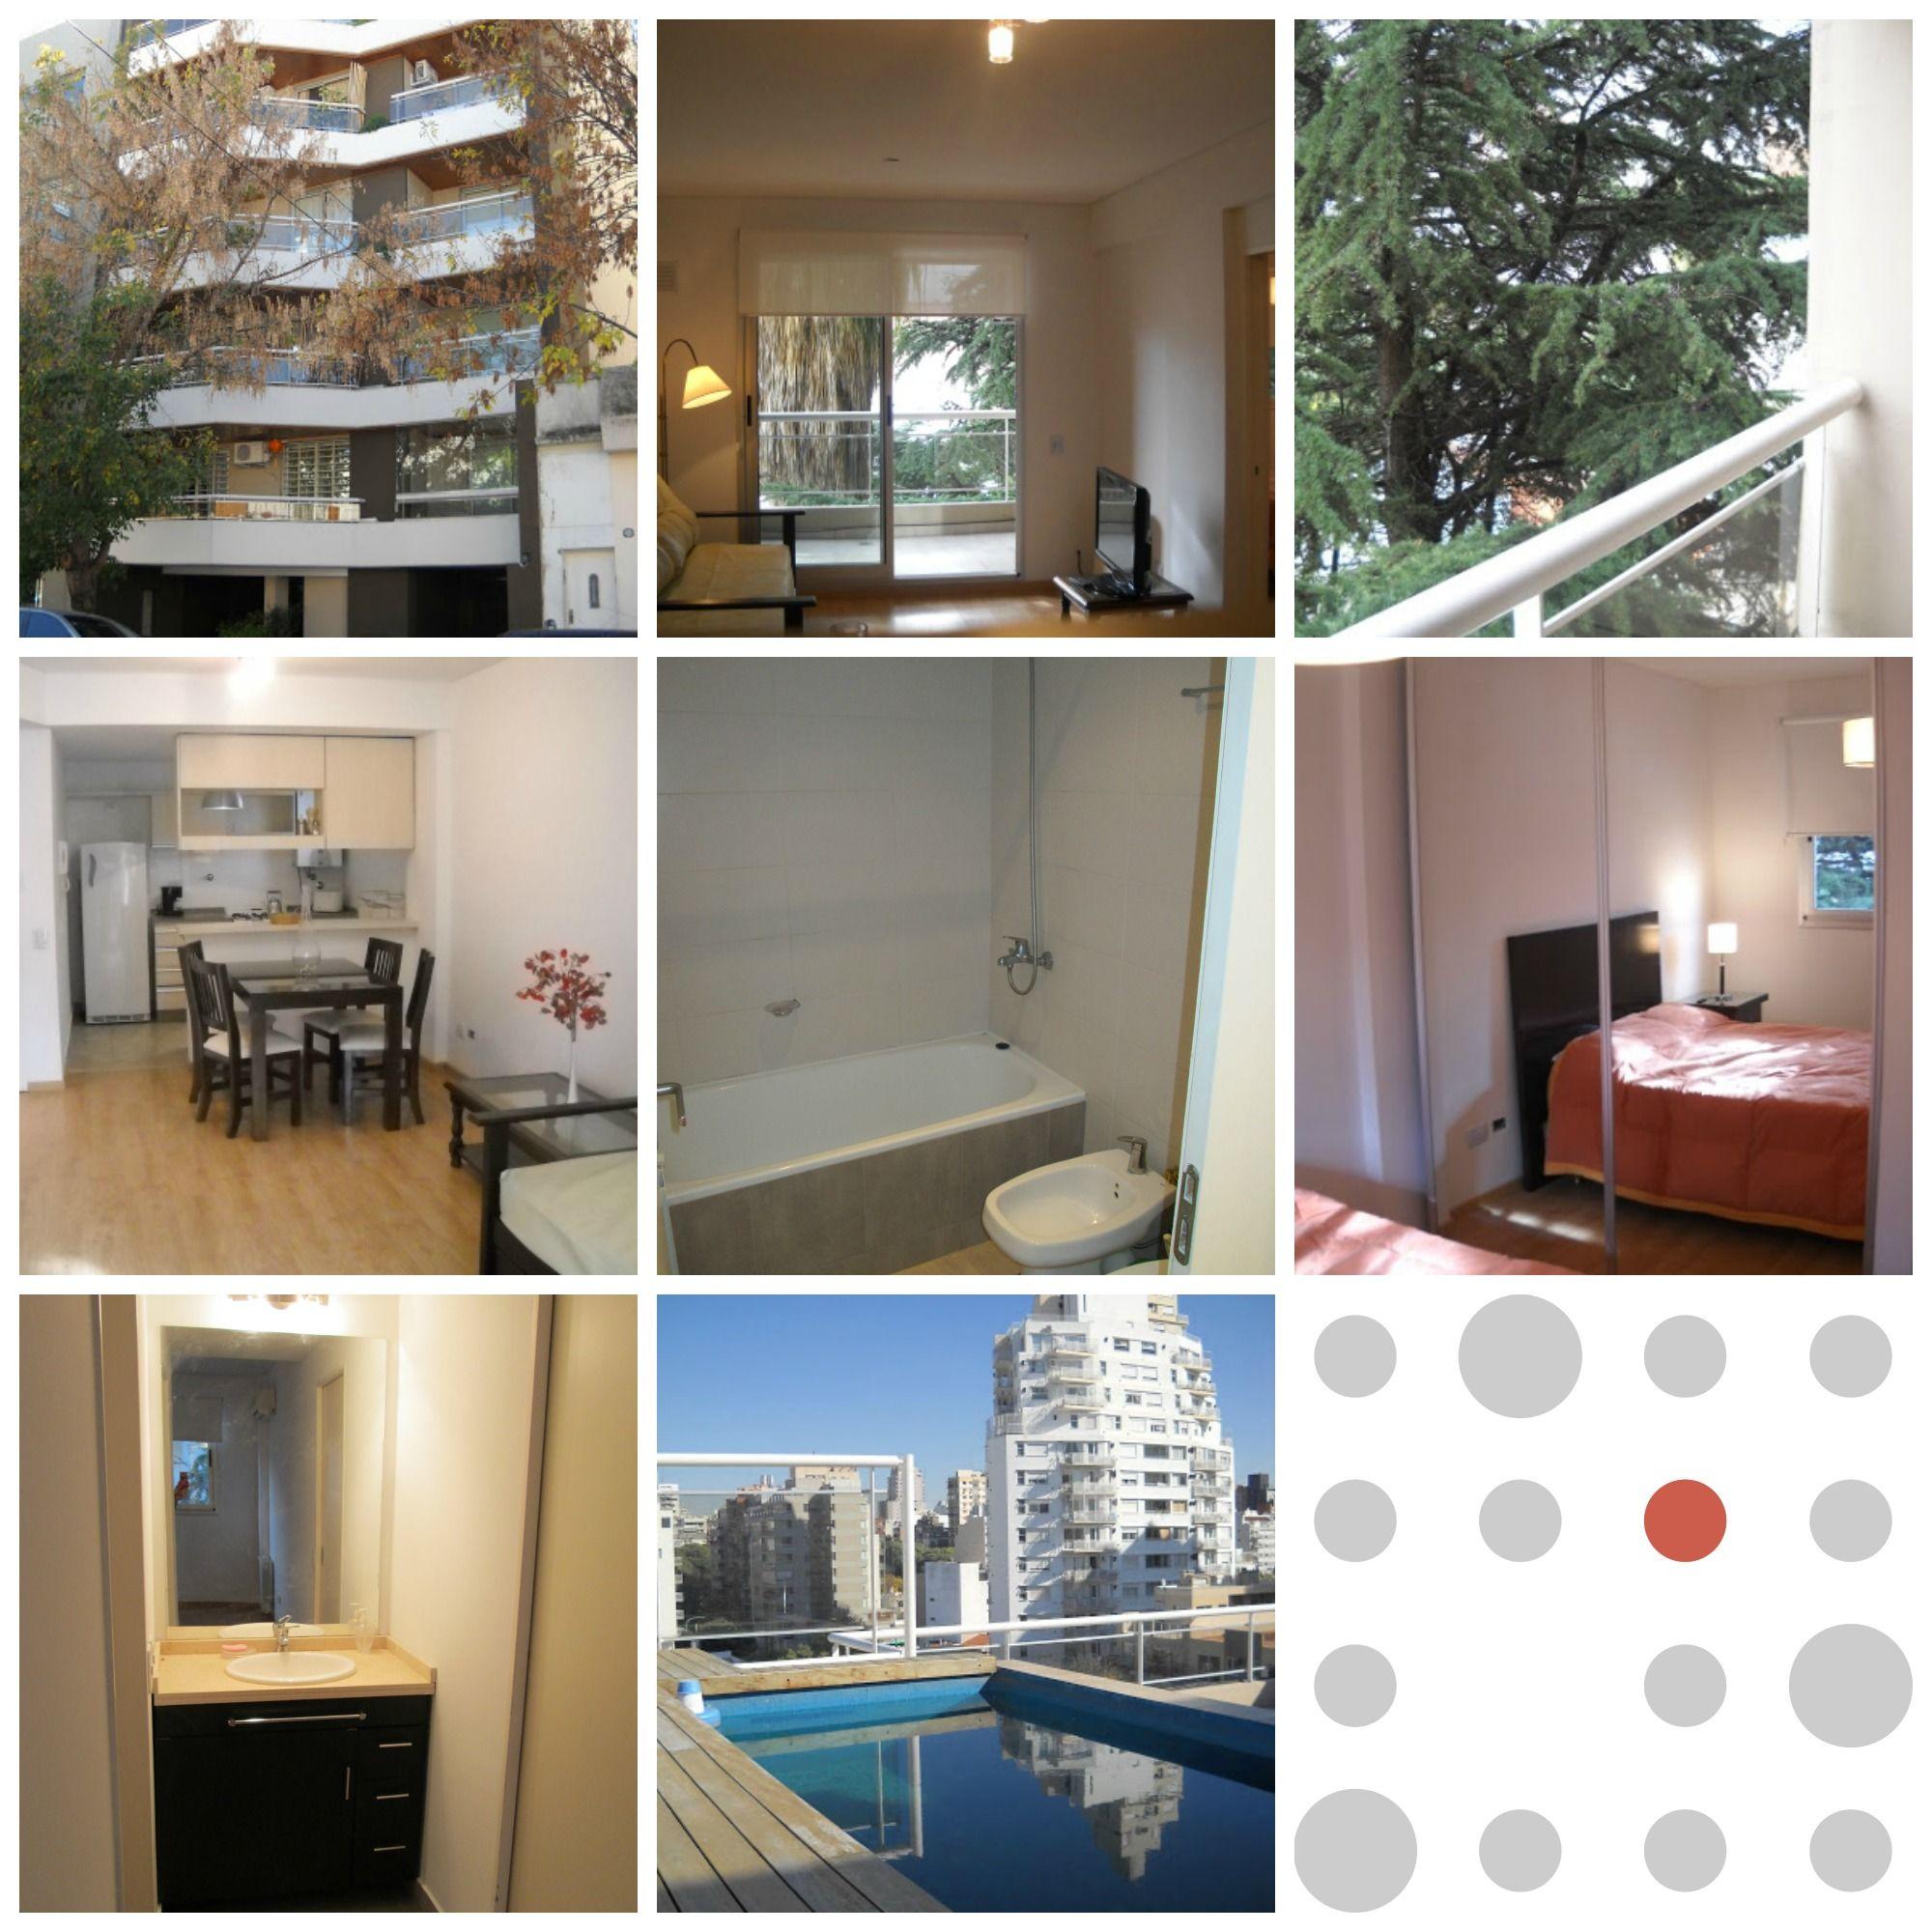 2 amb. Belgrano/Nuñez - ideal 1a. casa o inversión #pampapropiedades #casasetc